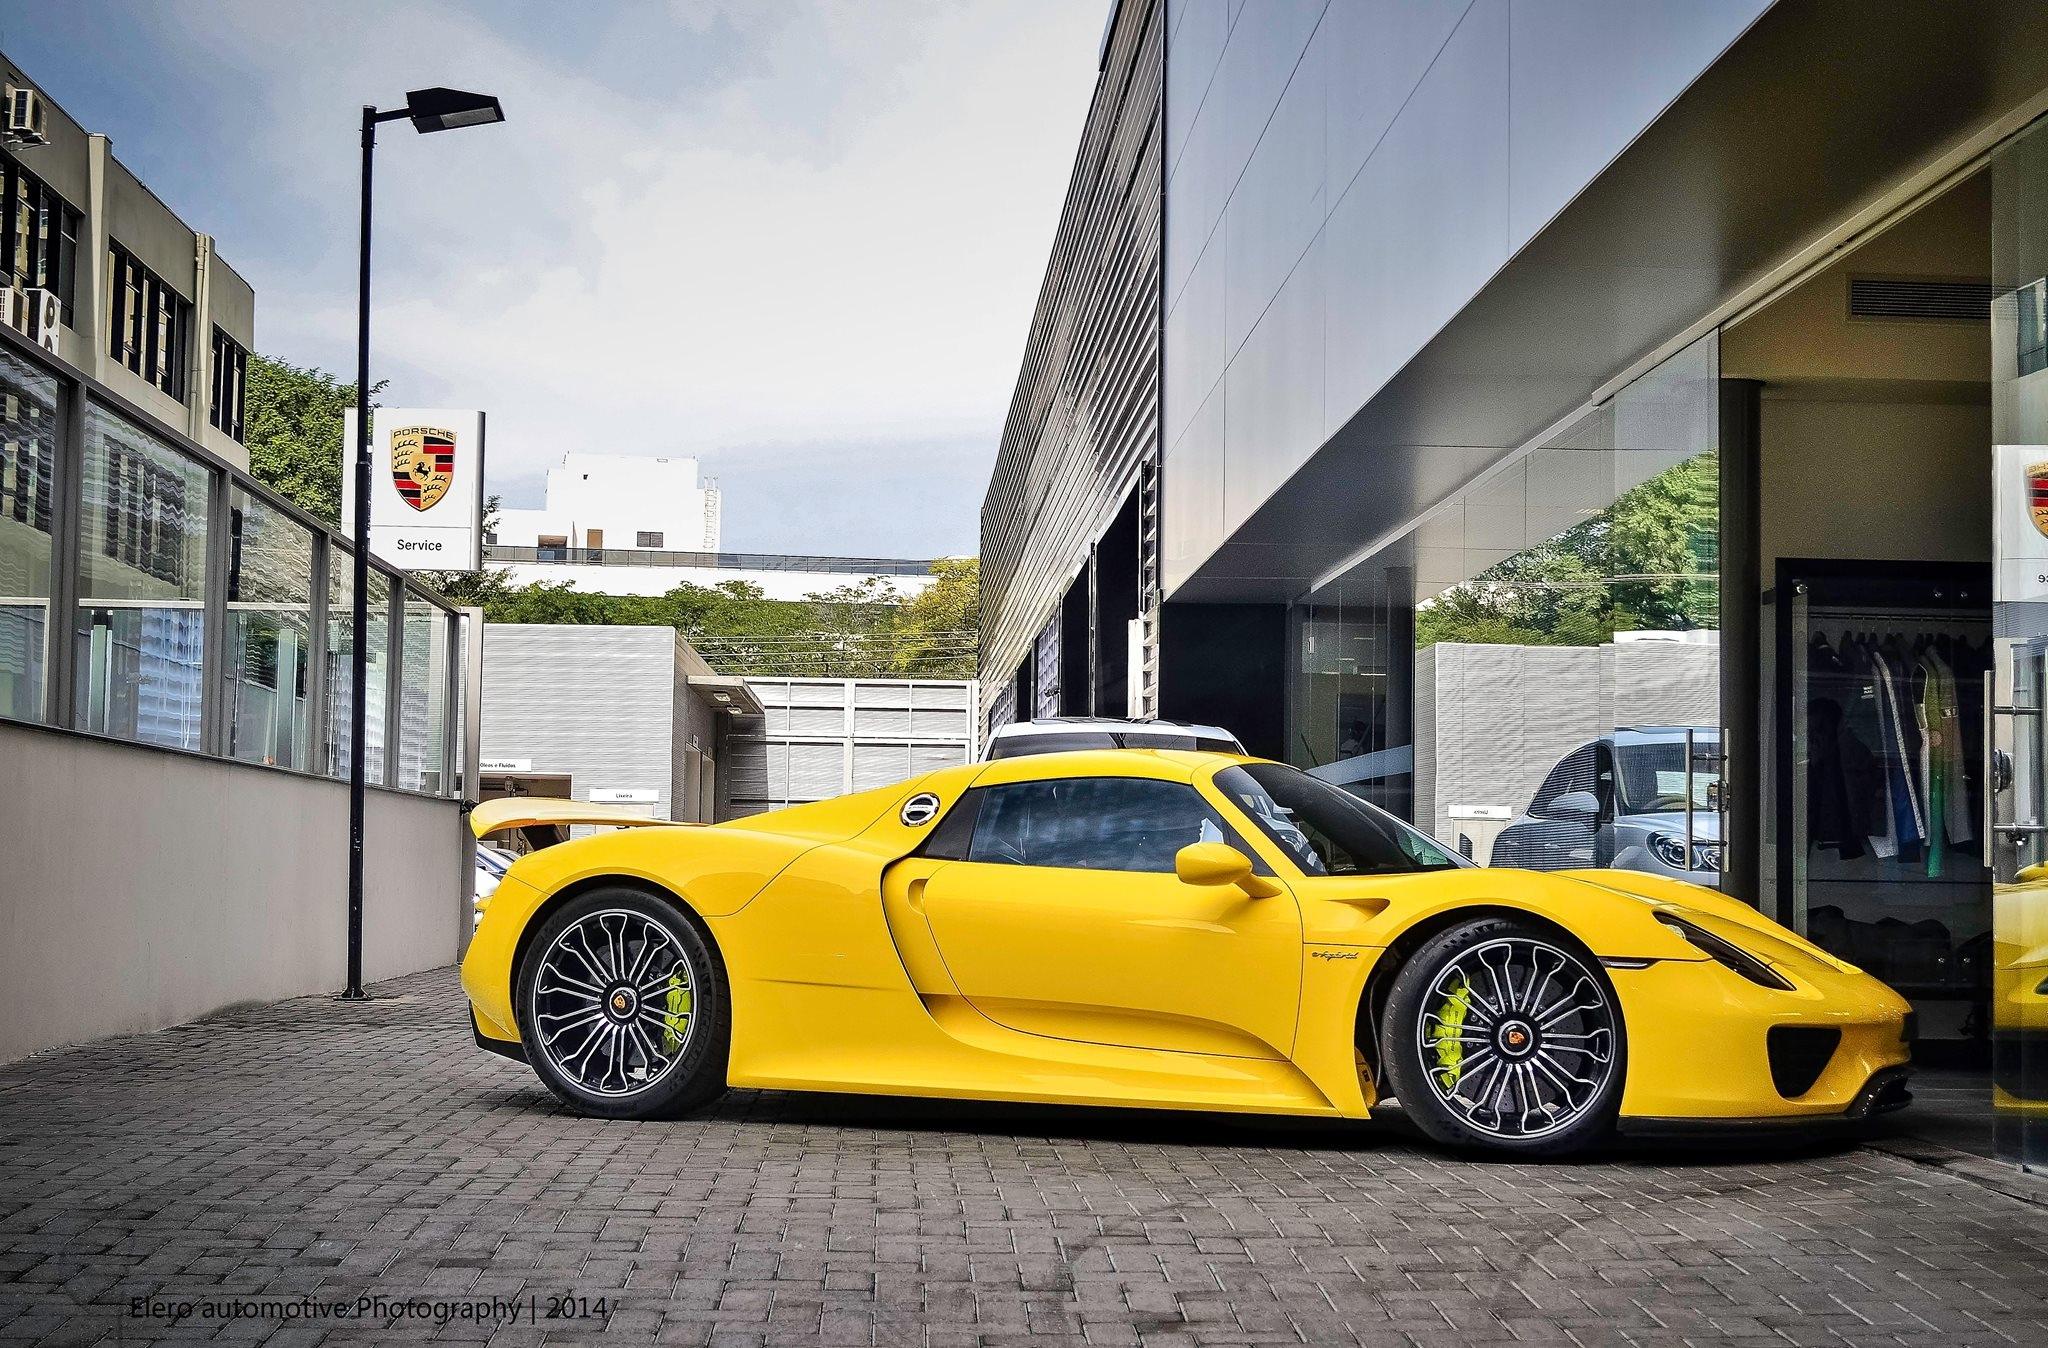 2 Gorgeous Porsche 918 Spyder Drag Race Cars Trend